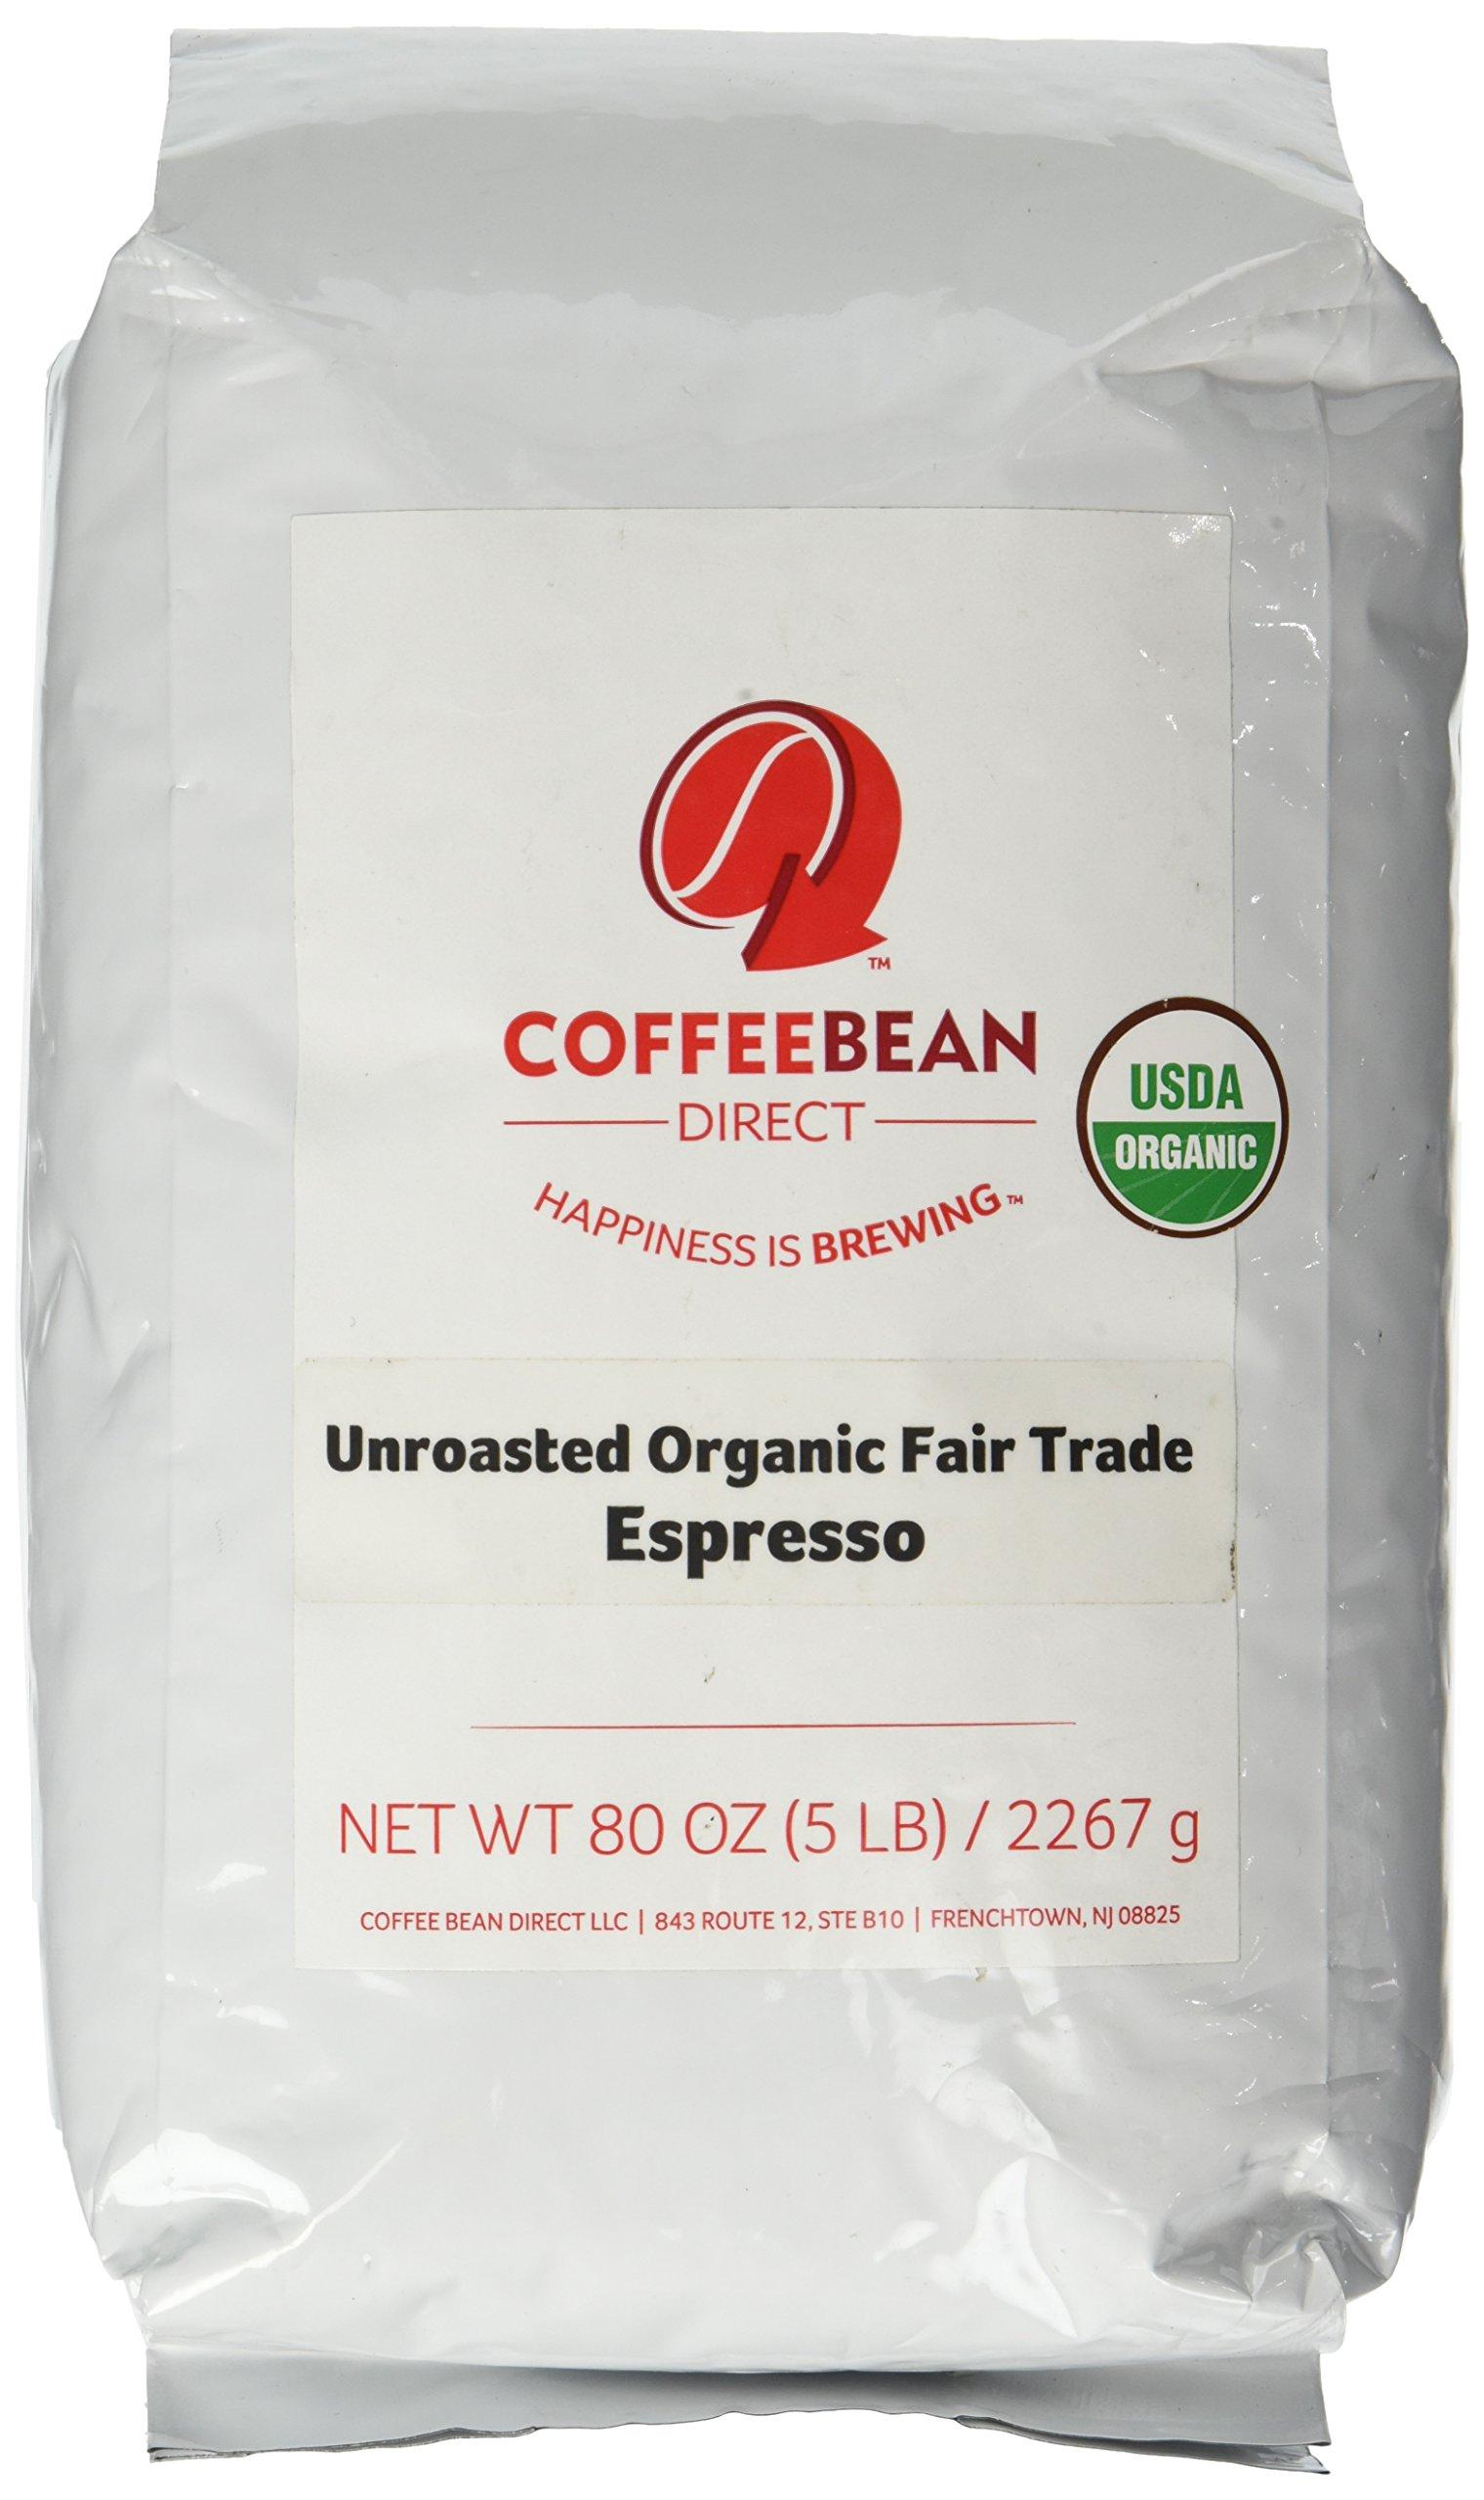 Green Unroasted Fair Trade Espresso Blend, Whole Bean Coffee, 5-Pound Bag